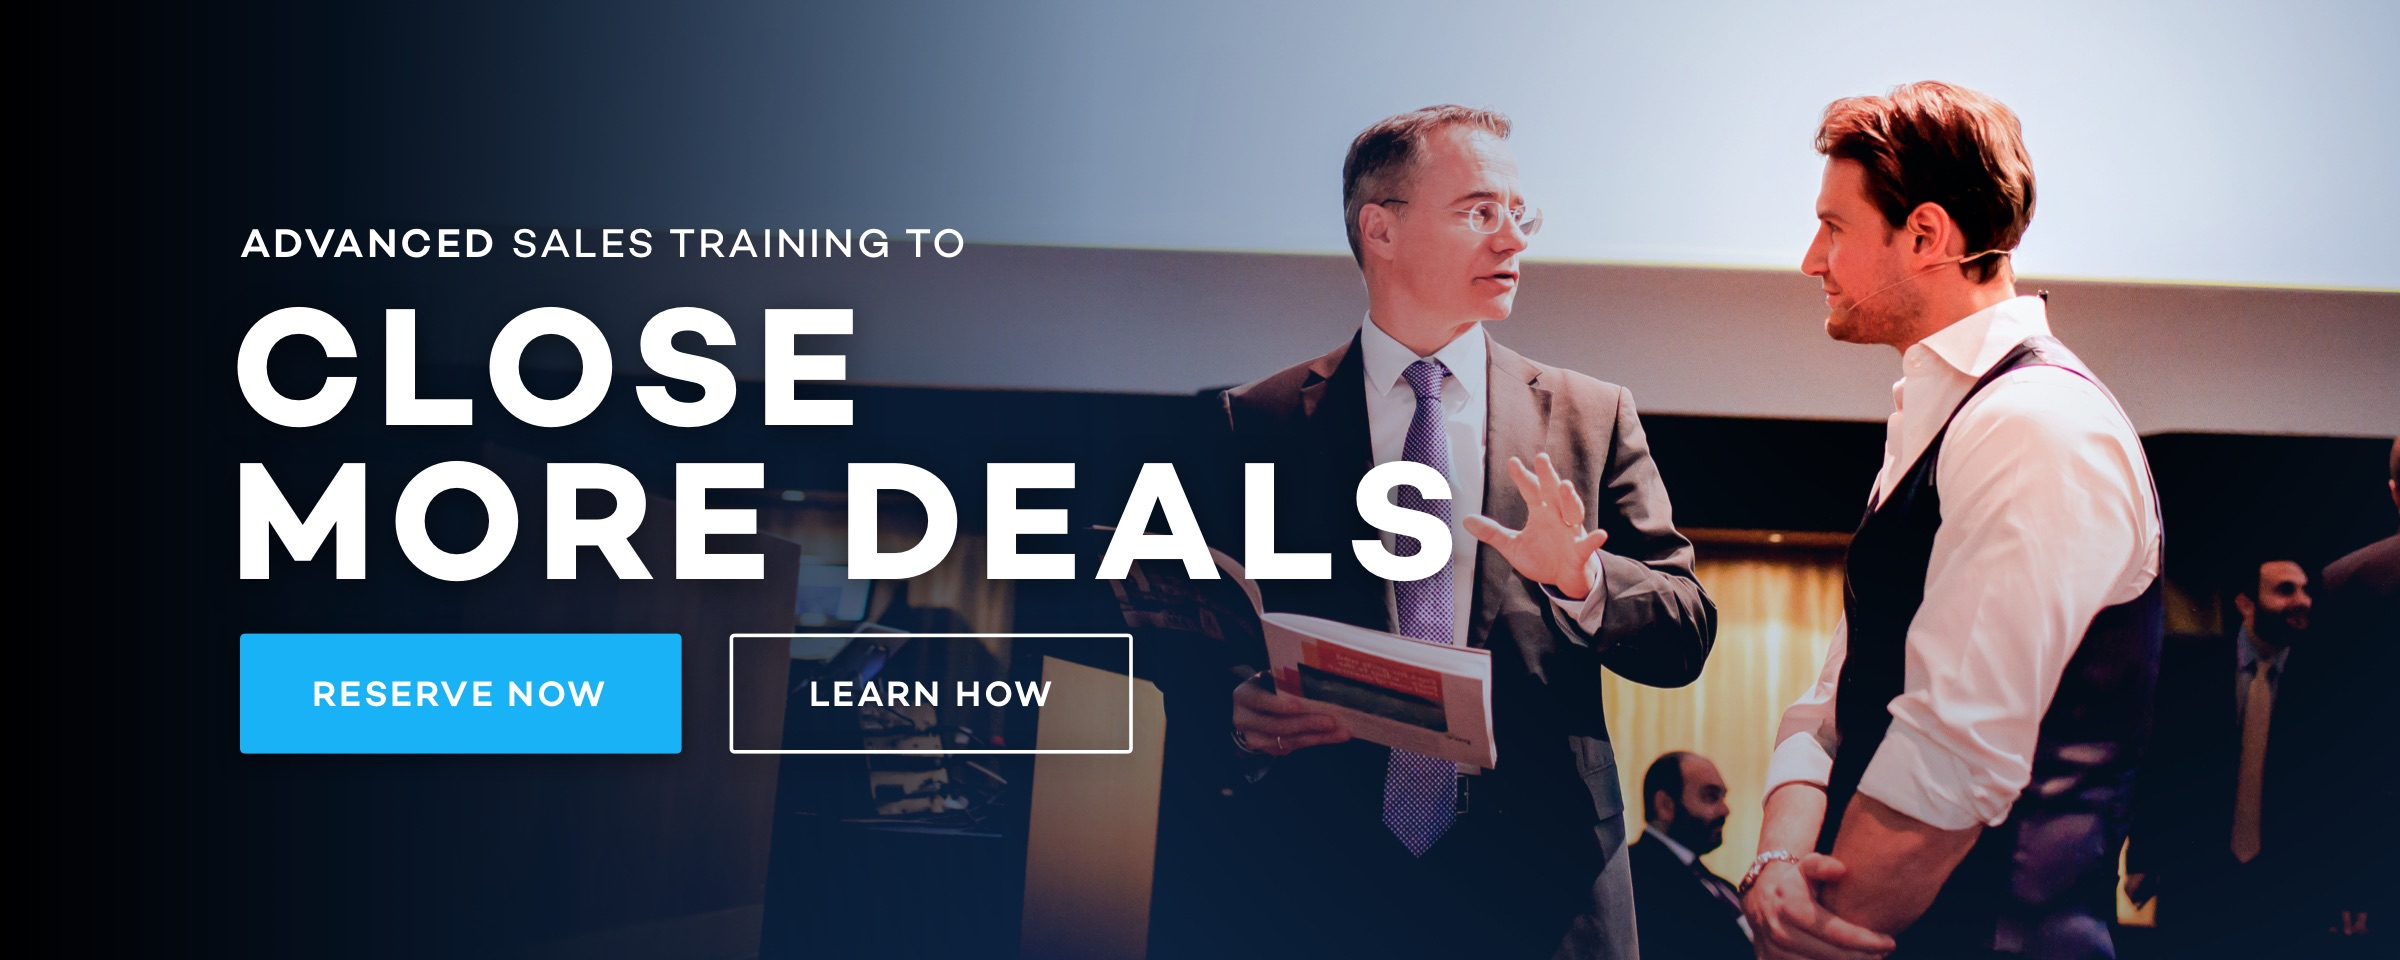 Advanced sales training that closes more deals